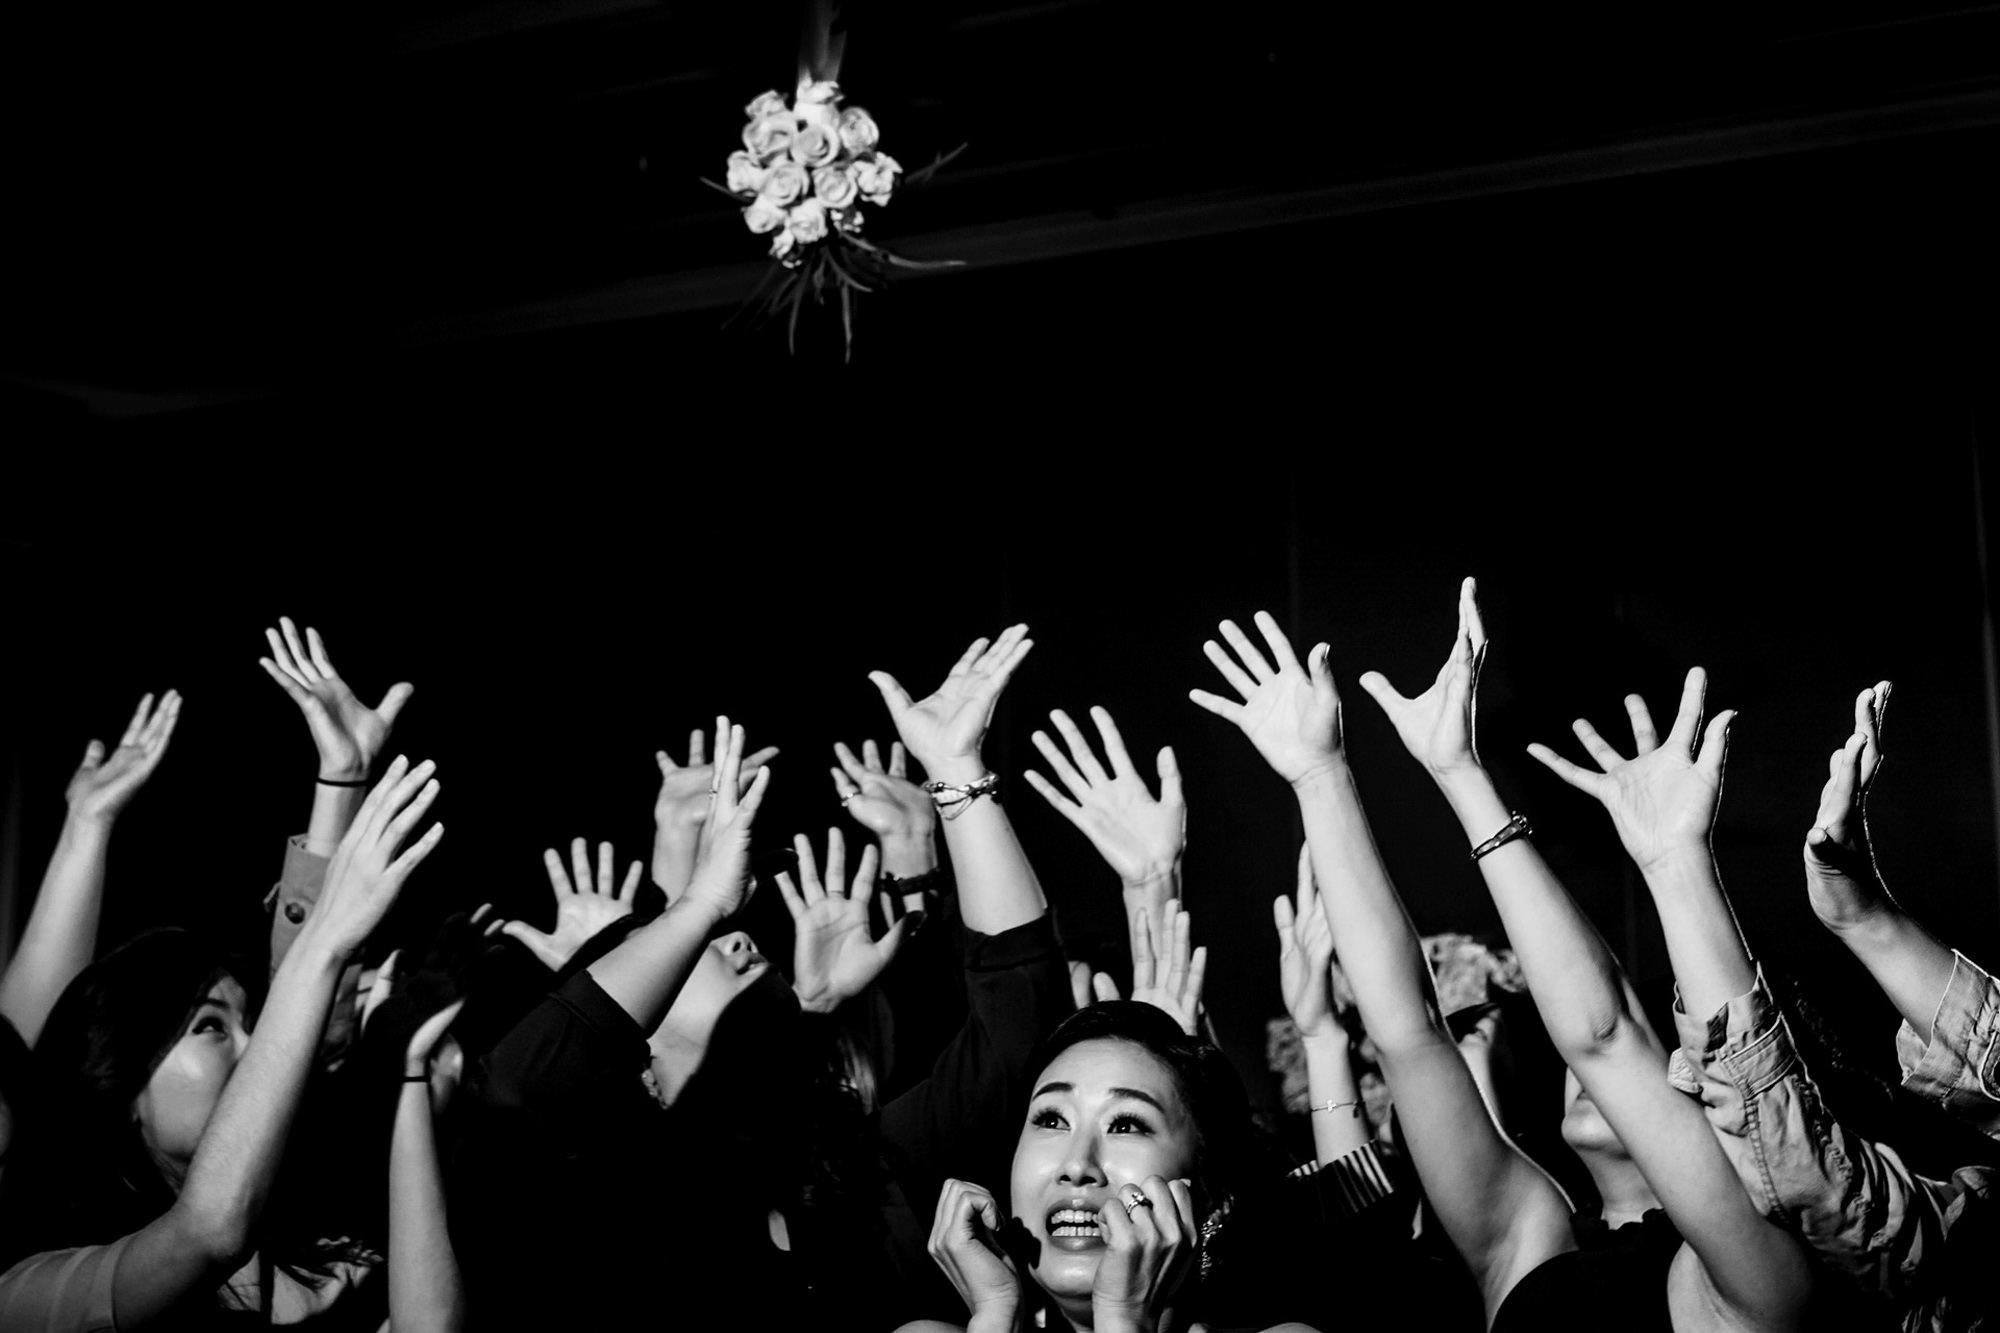 Hands catching bouquet - photo by Ken Pak